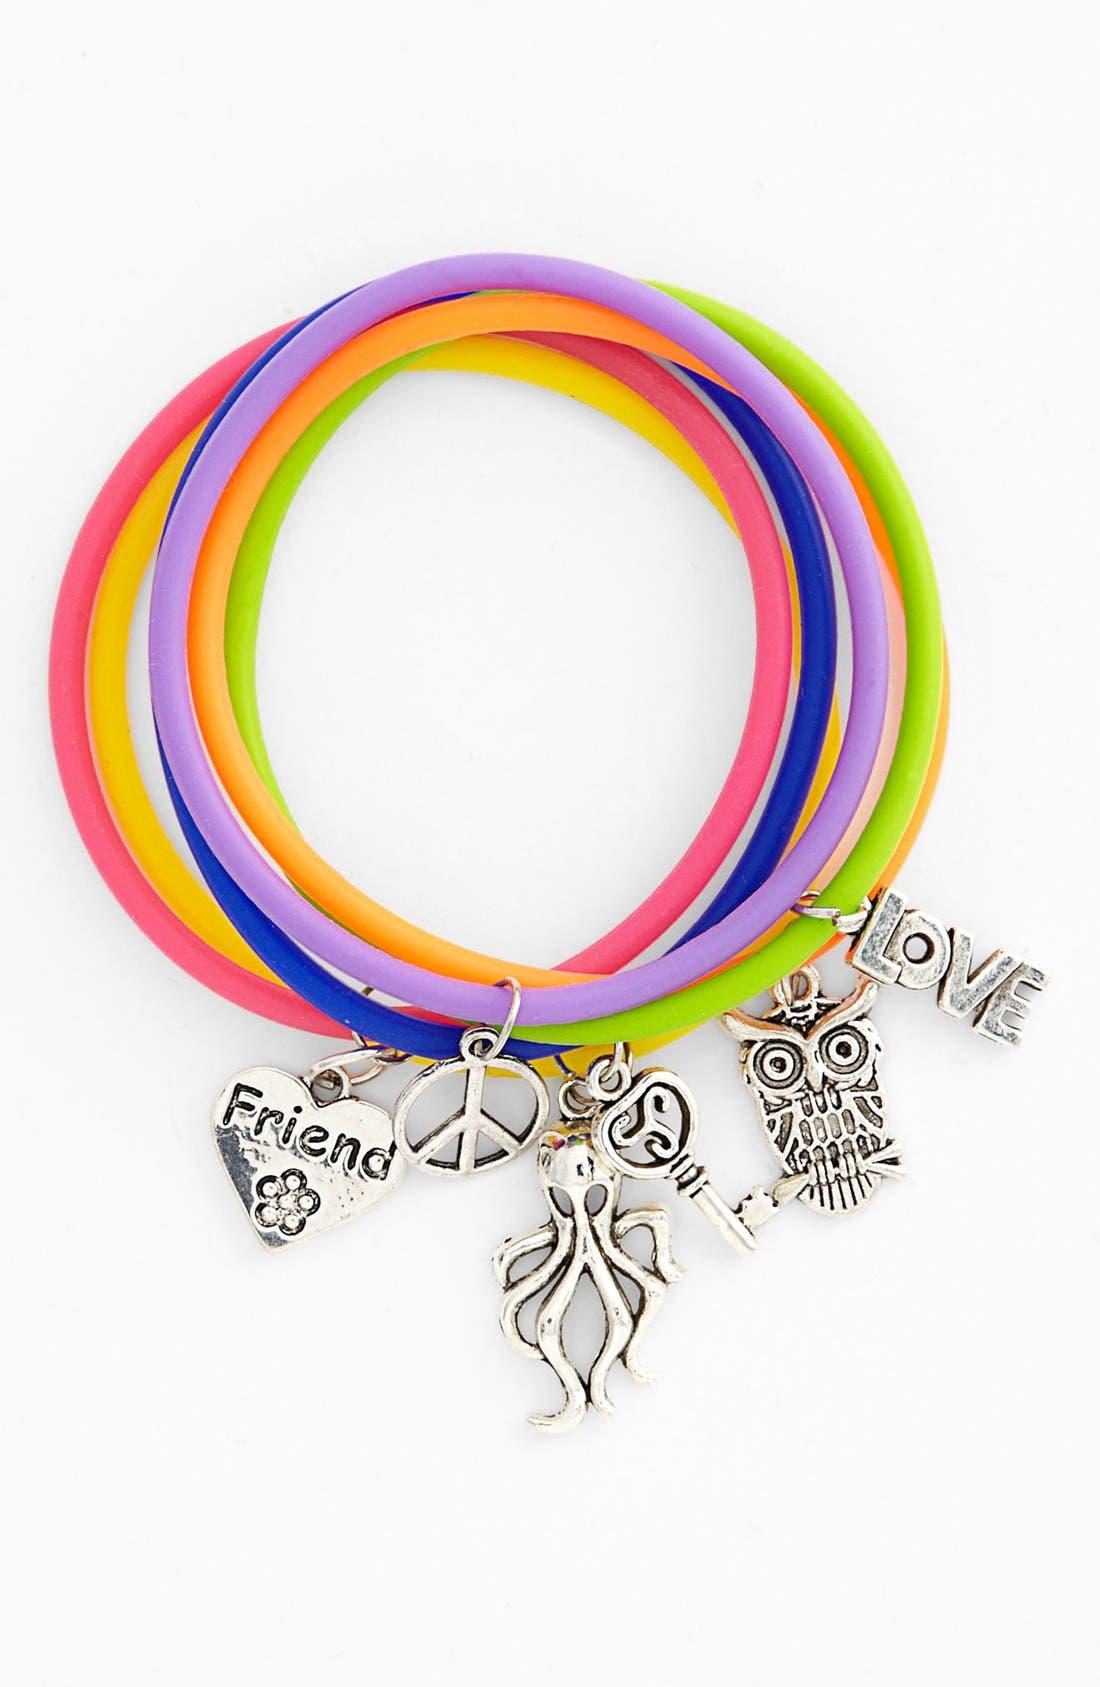 Alternate Image 1 Selected - Rolf Bleu Jelly Charm Bracelet (Girls)